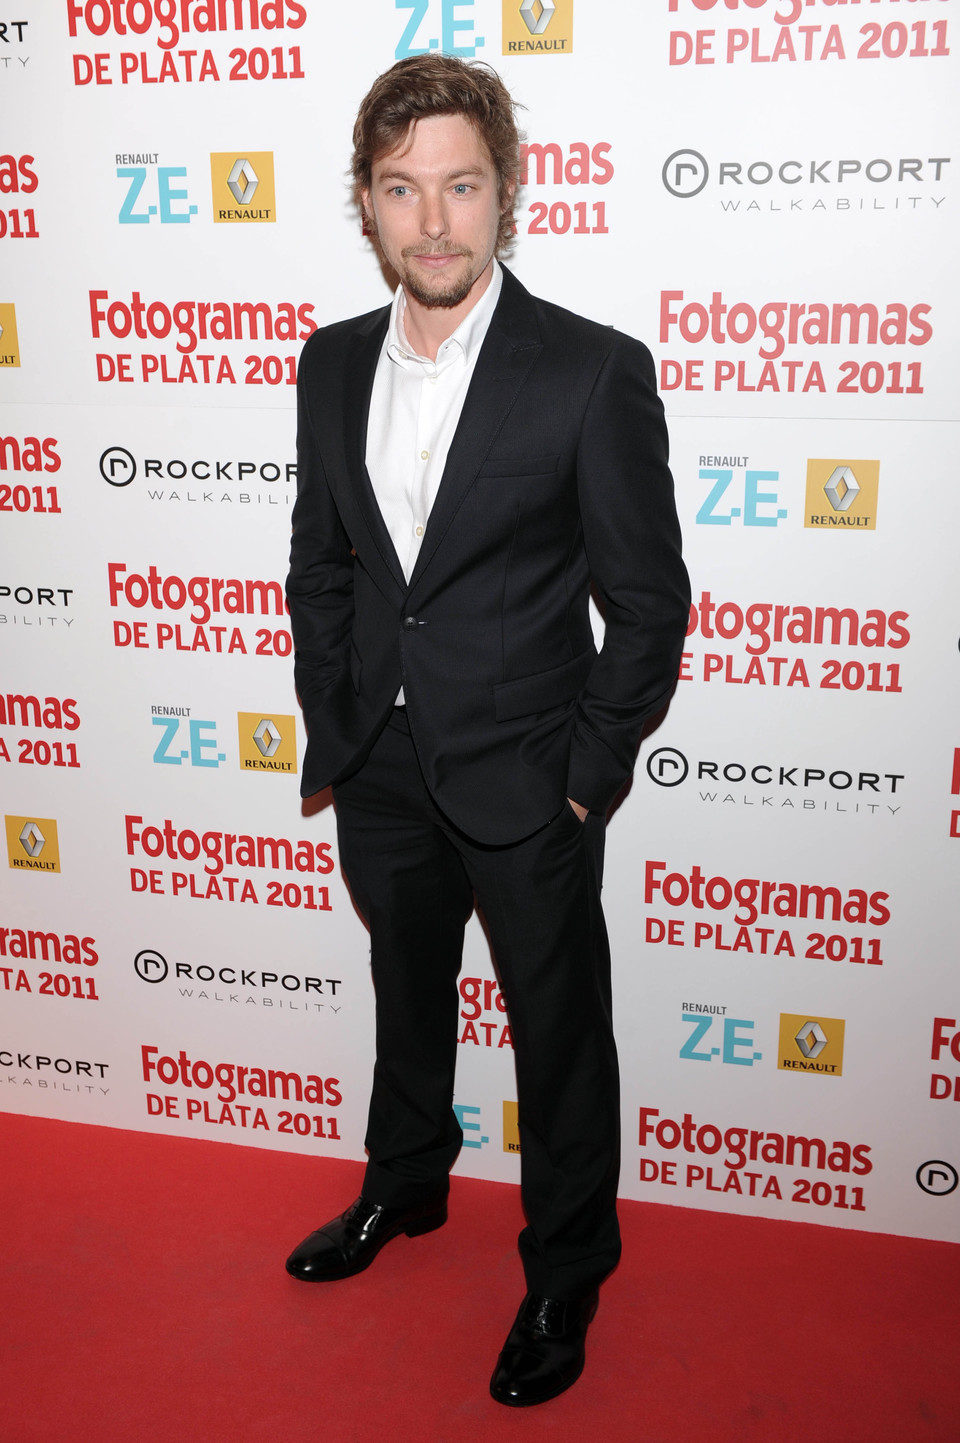 Jan Cornet en los Fotogramas de Plata 2011